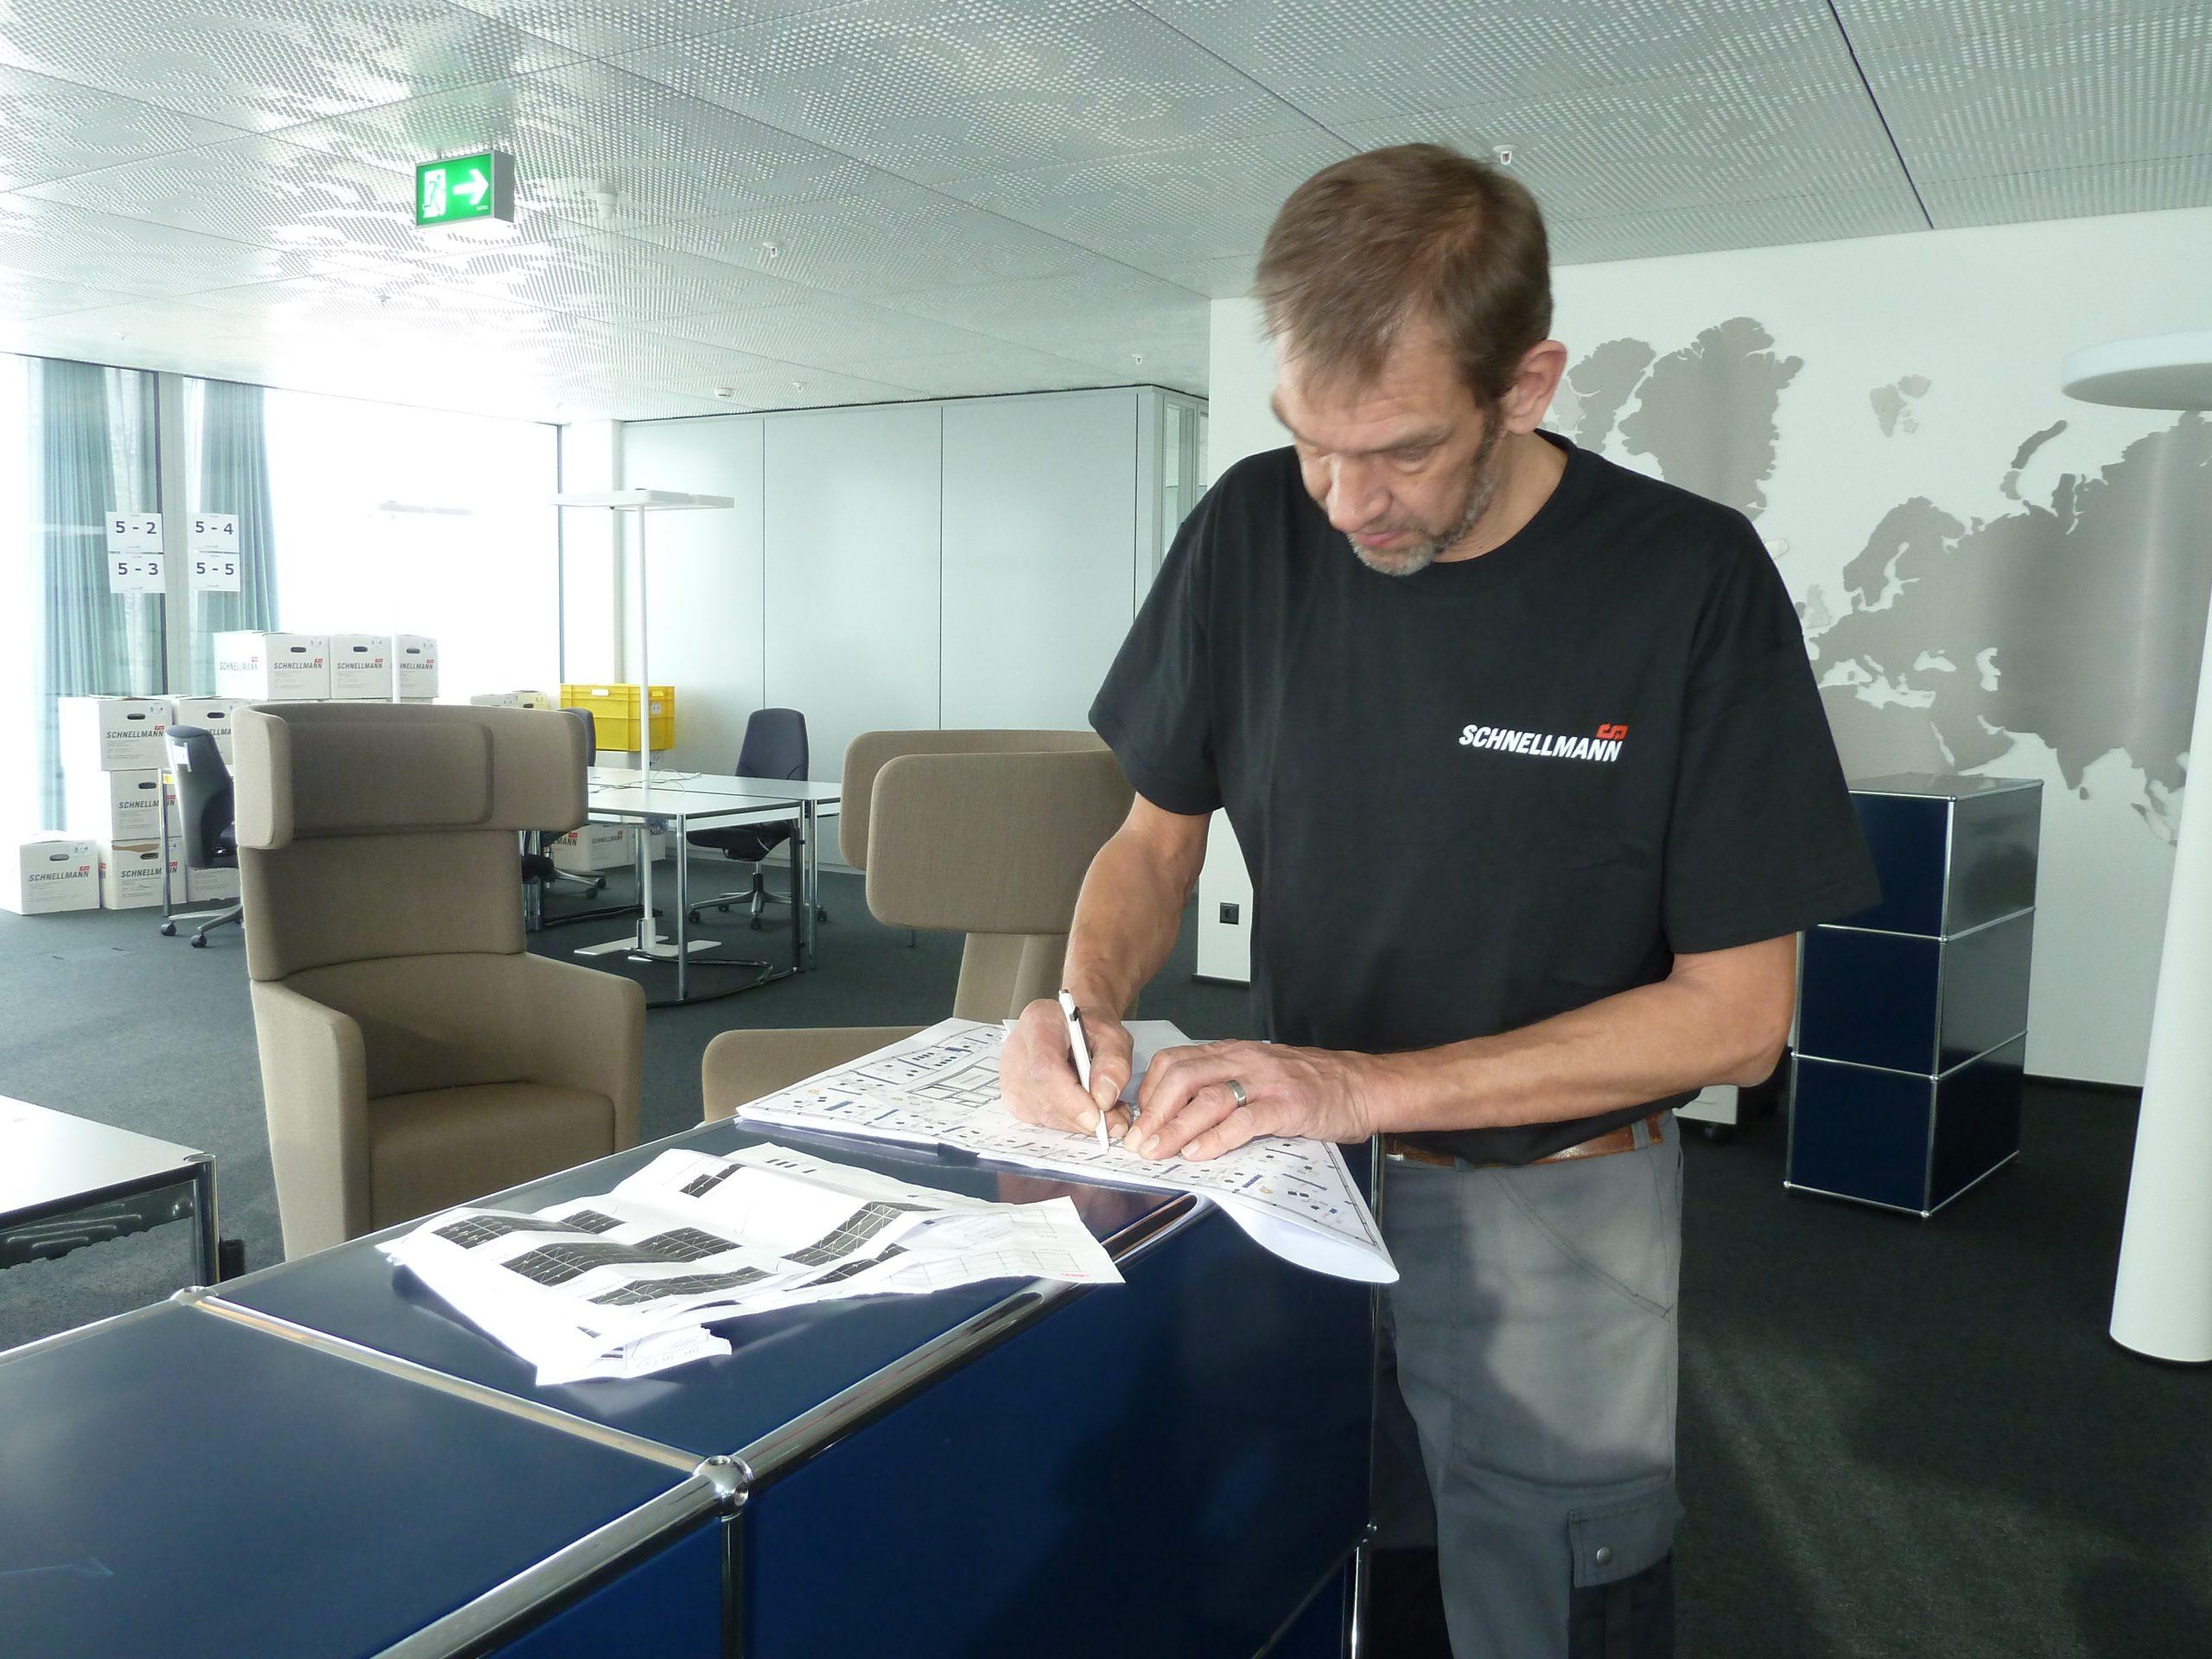 Belegungsplanung – Büroplanung in Corona Zeiten